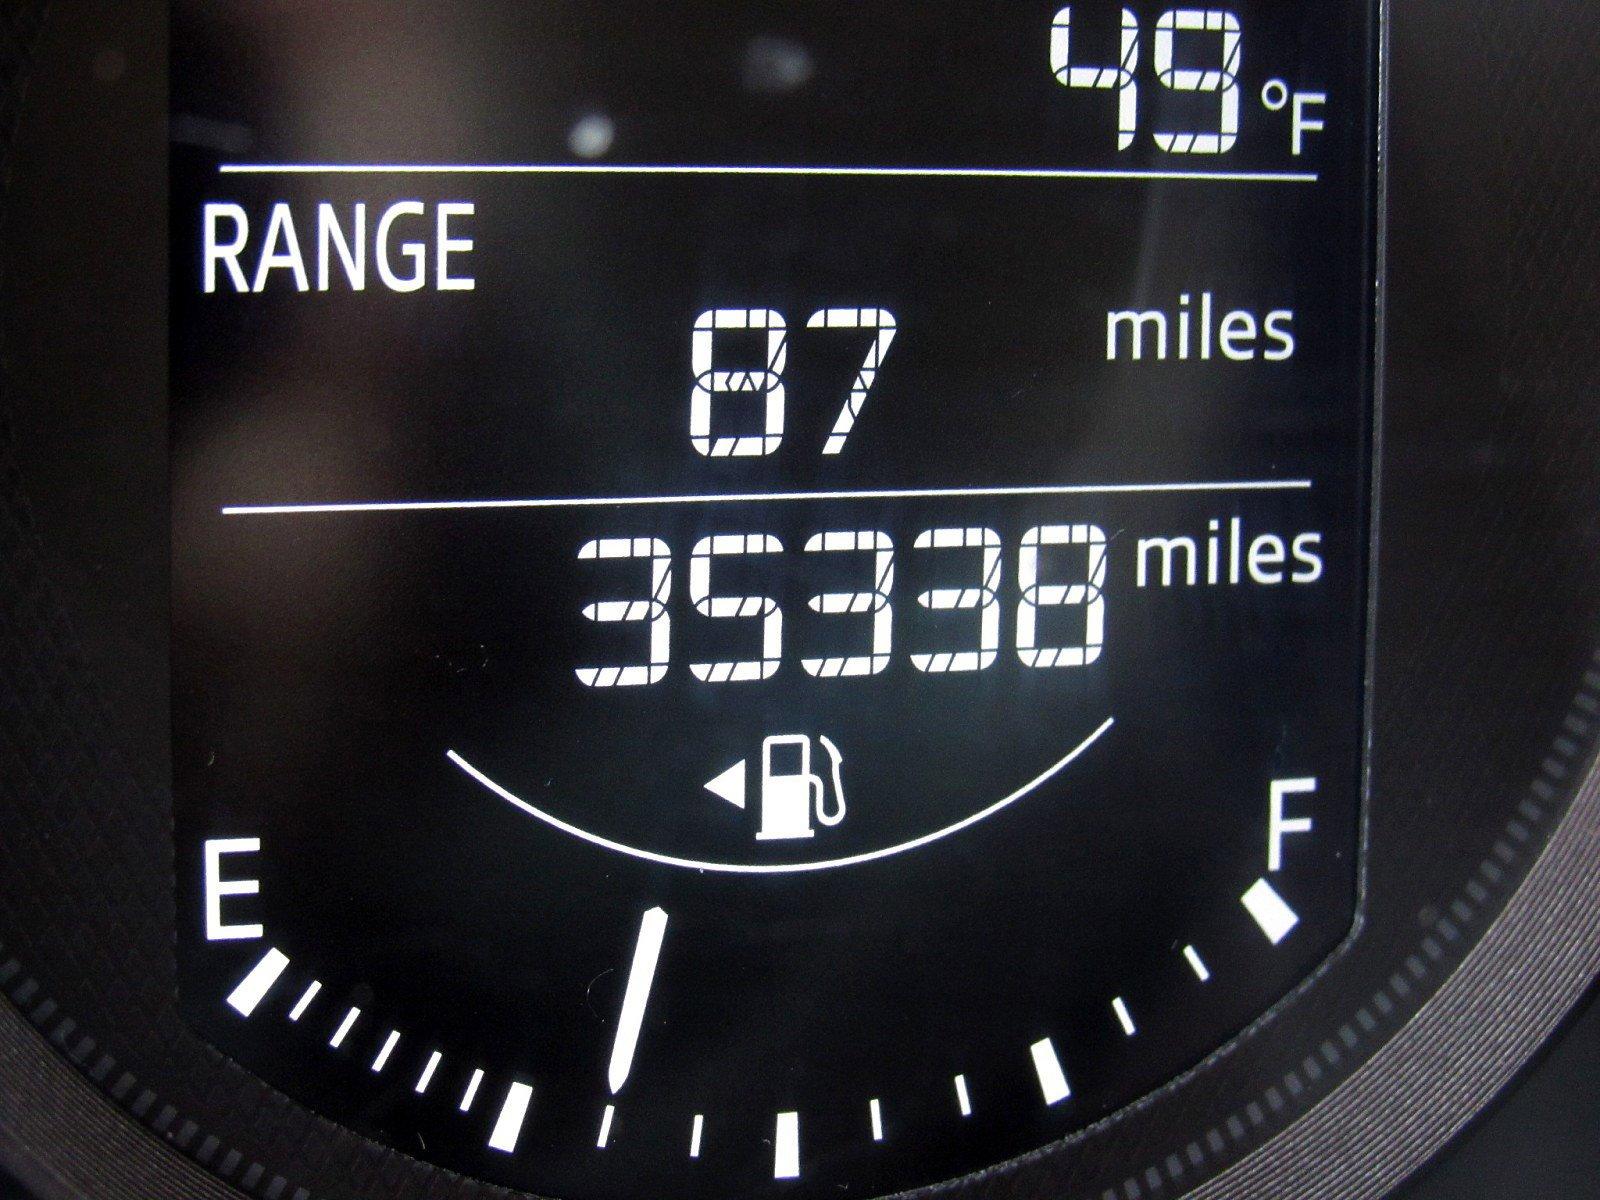 2016 Mazda CX-9 Sport Utility